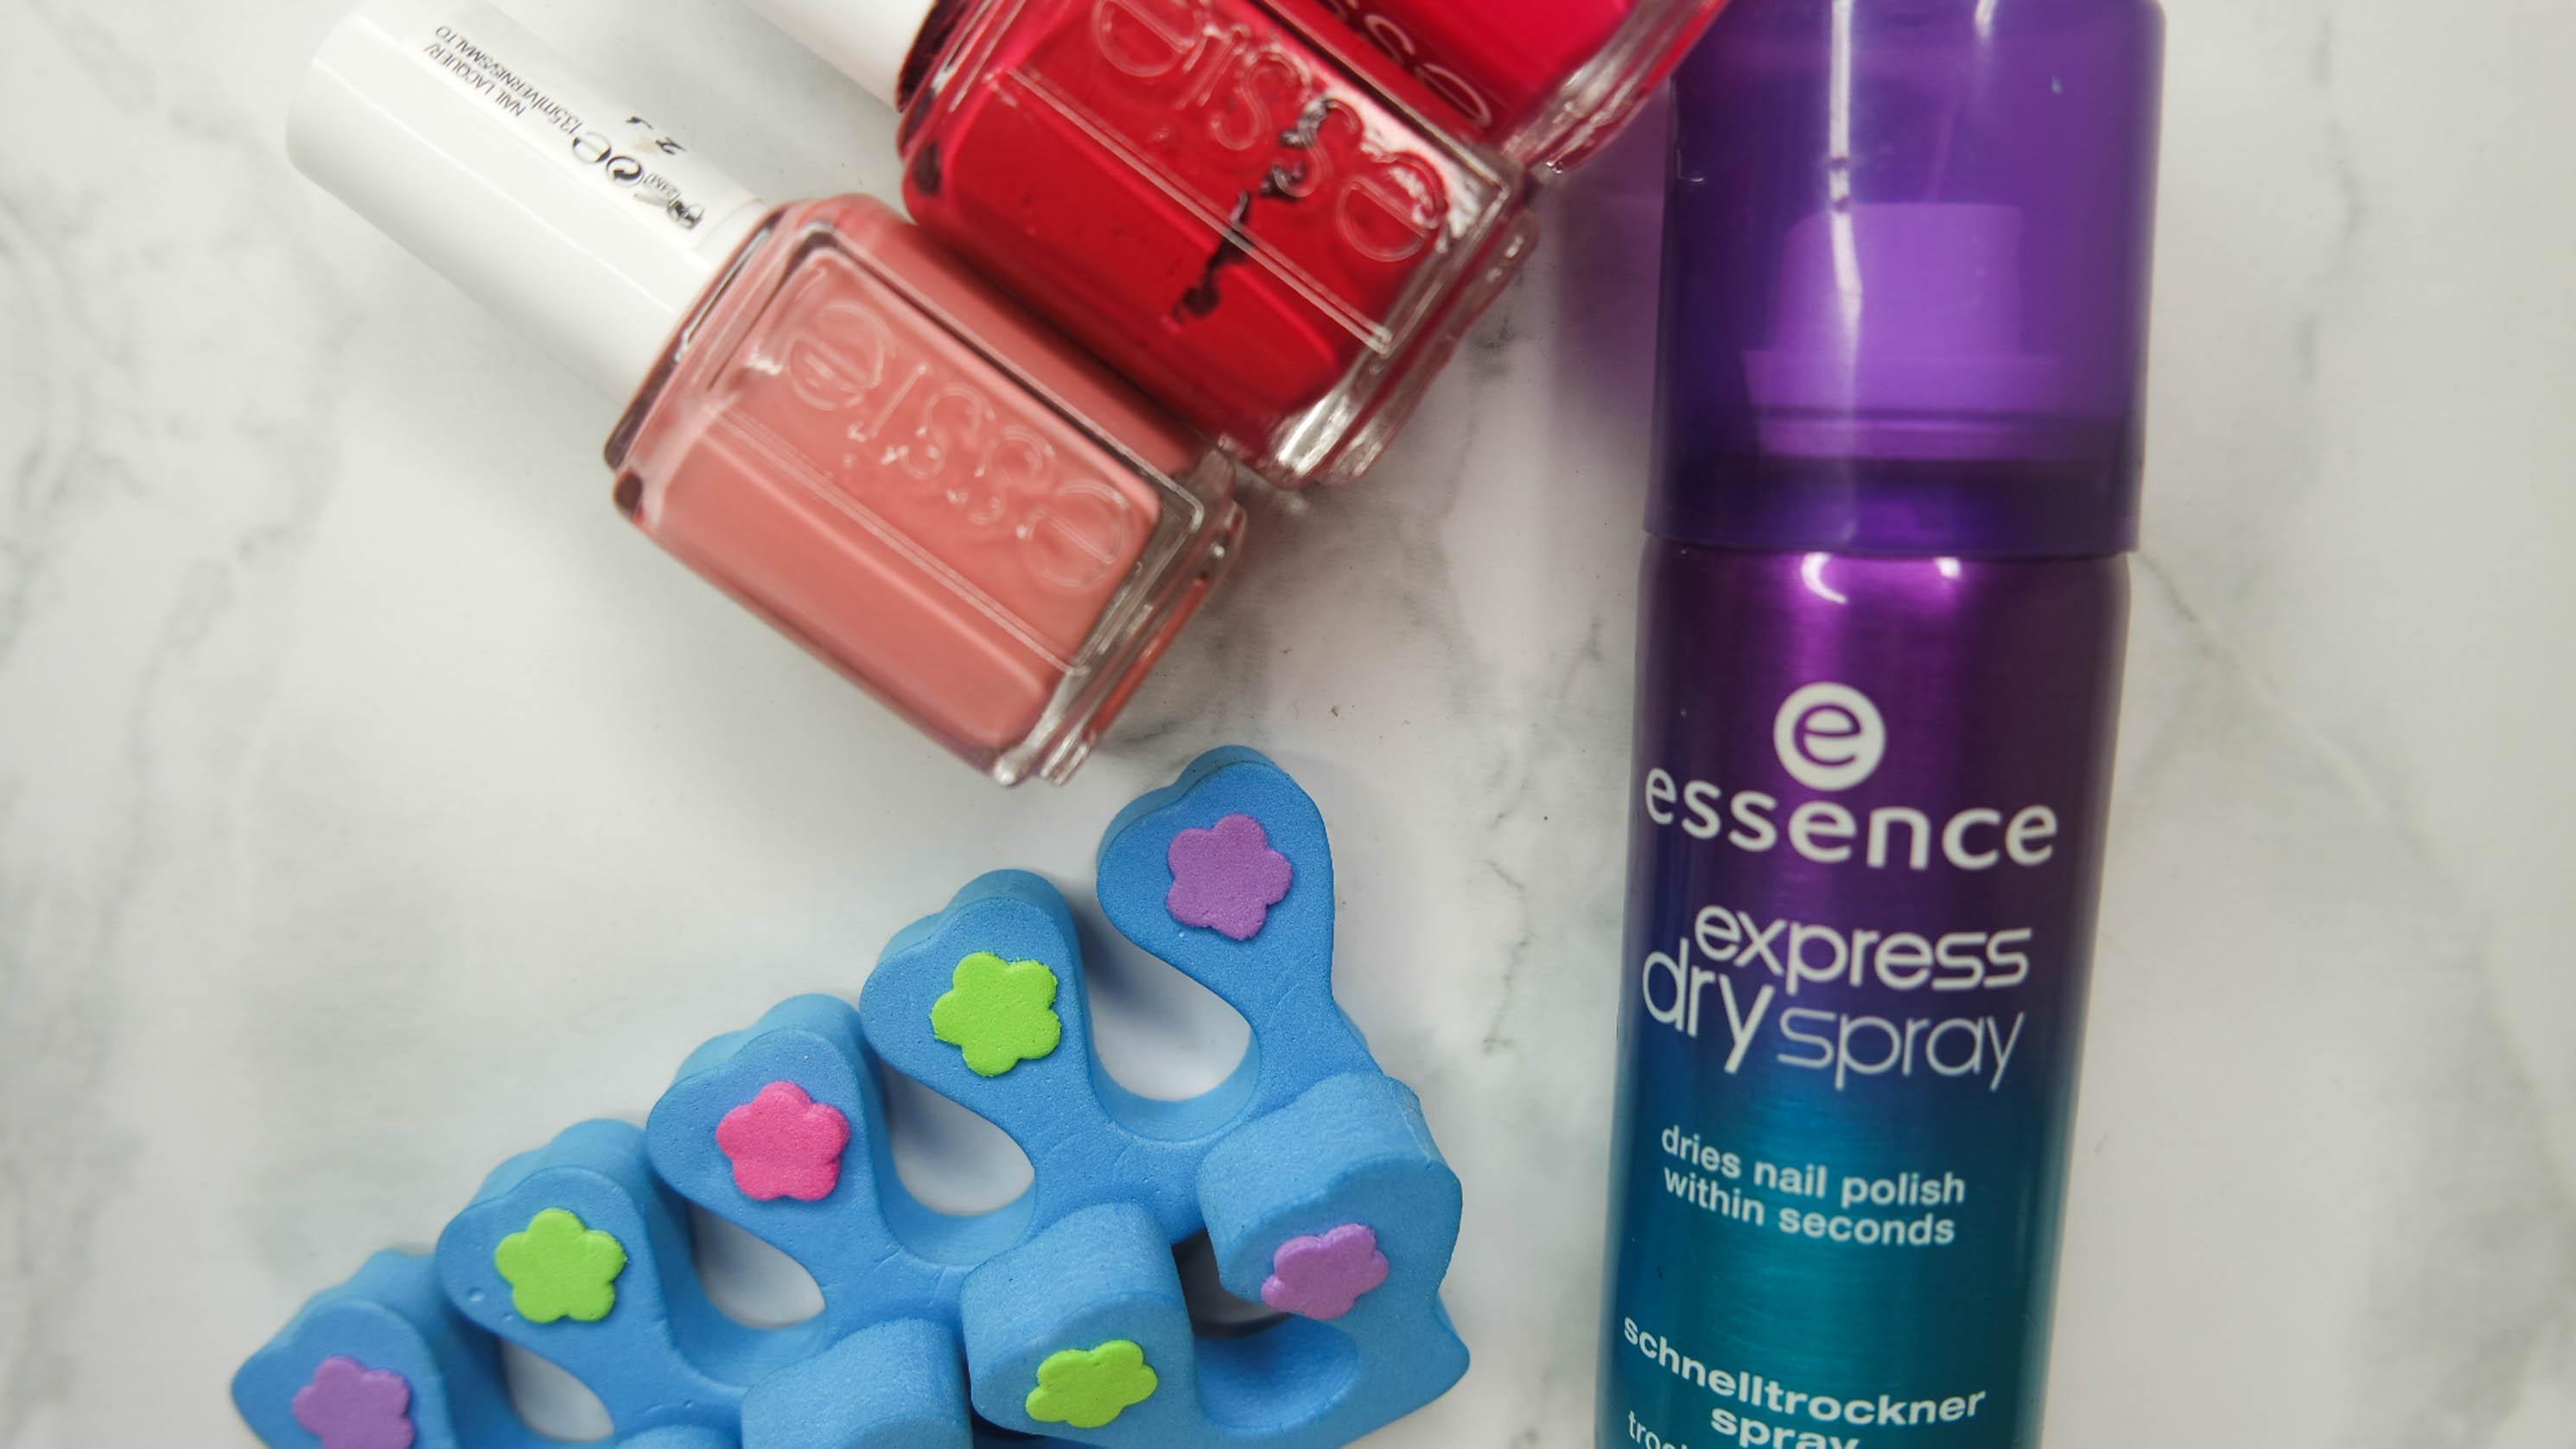 Essence-Express-Dry-Spray